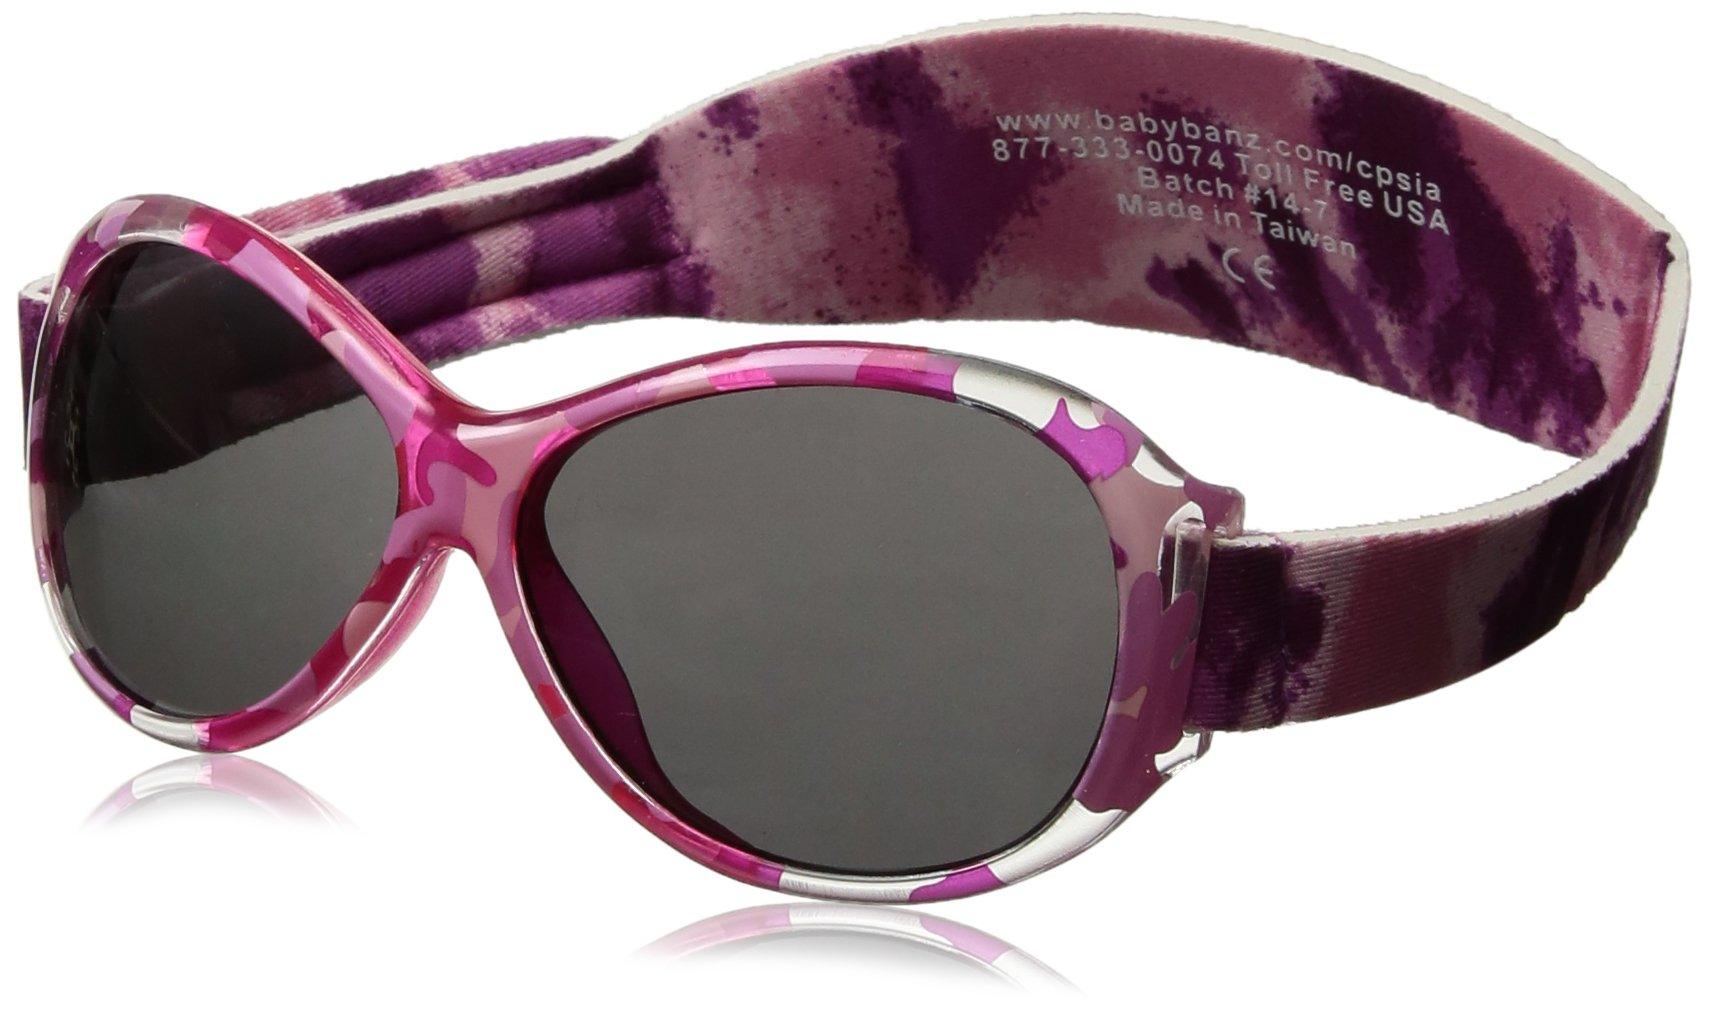 Baby Banz Retro Banz Oval Baby Sunglasses,Pink Diva Camo,One size